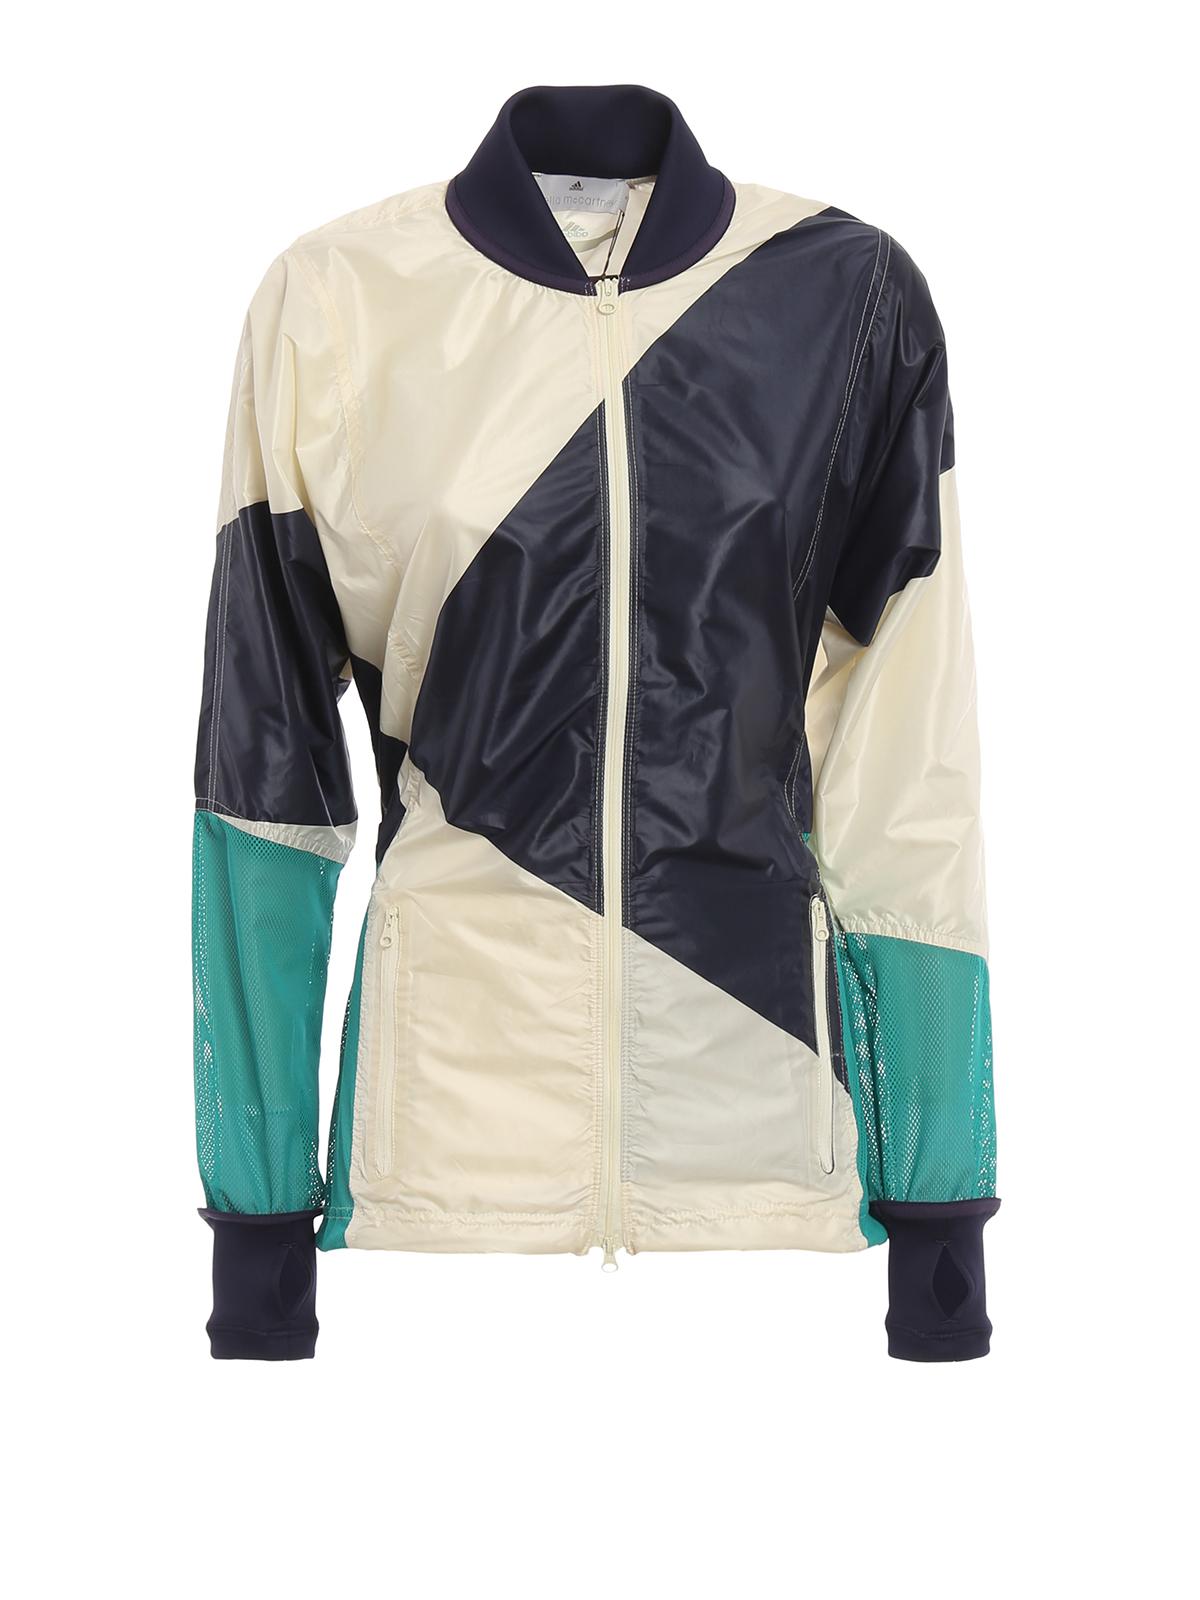 3ae7229c9c ADIDAS BY STELLA MCCARTNEY  casual jackets - Run Kite running jacket